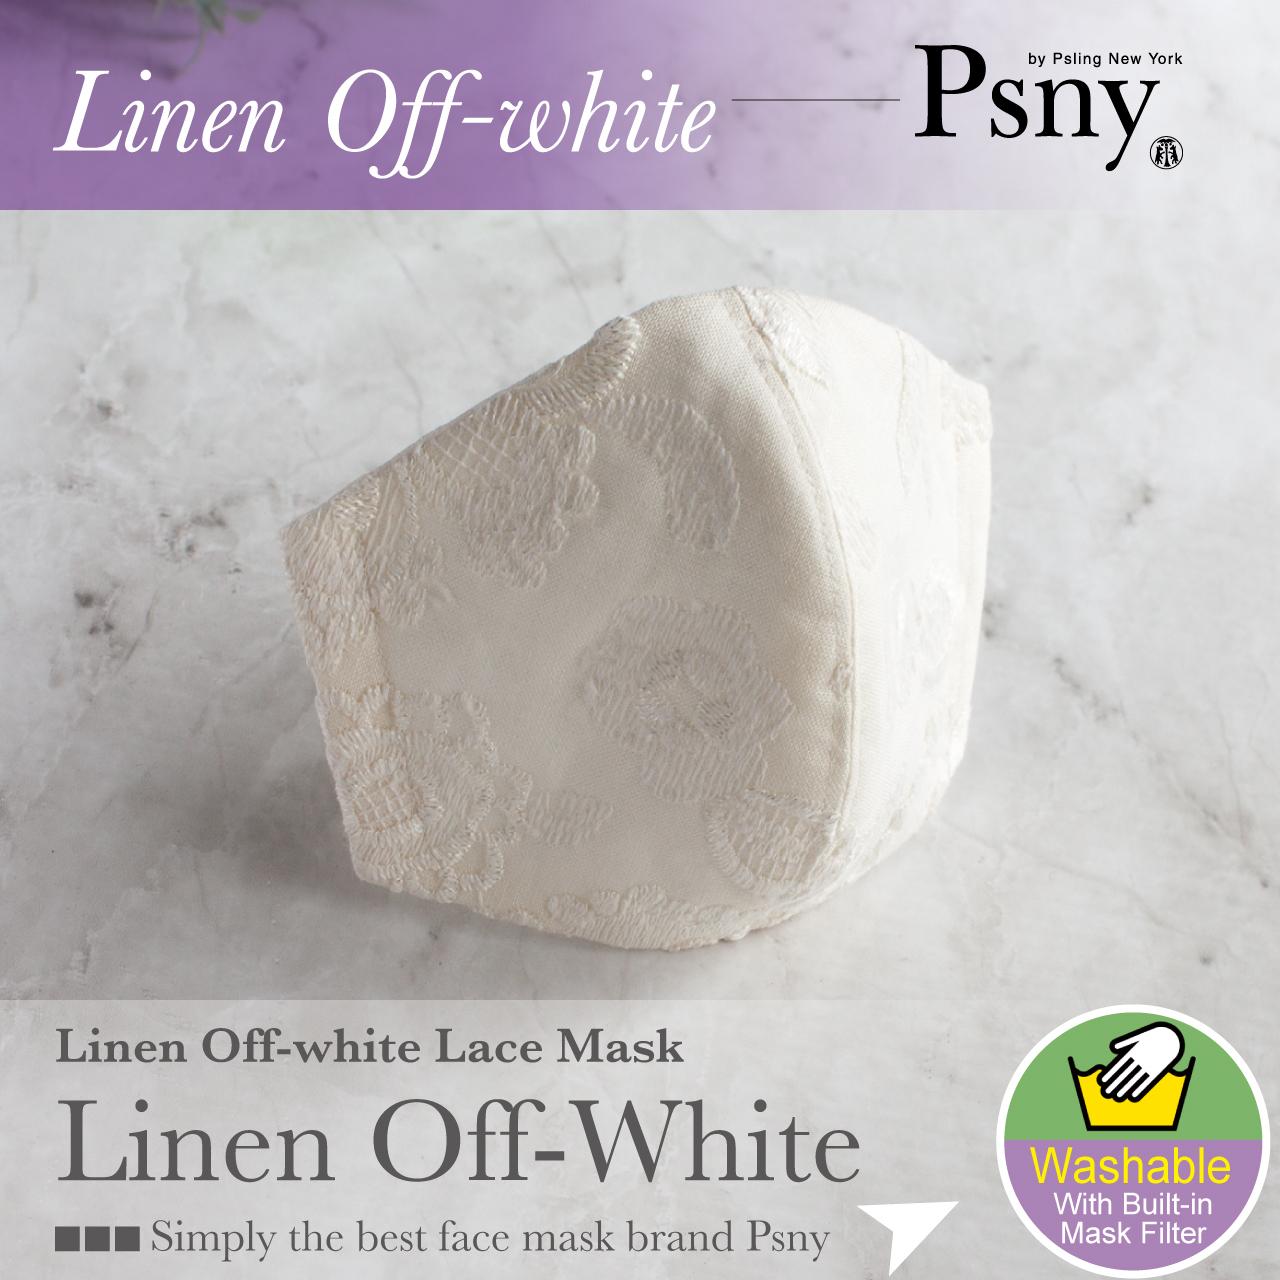 PSNY 送料無料 夏 リネン レース 花粉 黄砂 不織布フィルター入り 美人 美しい 上品 きれい 麻100% おとな ますく ナチュラル 清潔 大人用 マスク リネン・レース・オフホワイト-L52